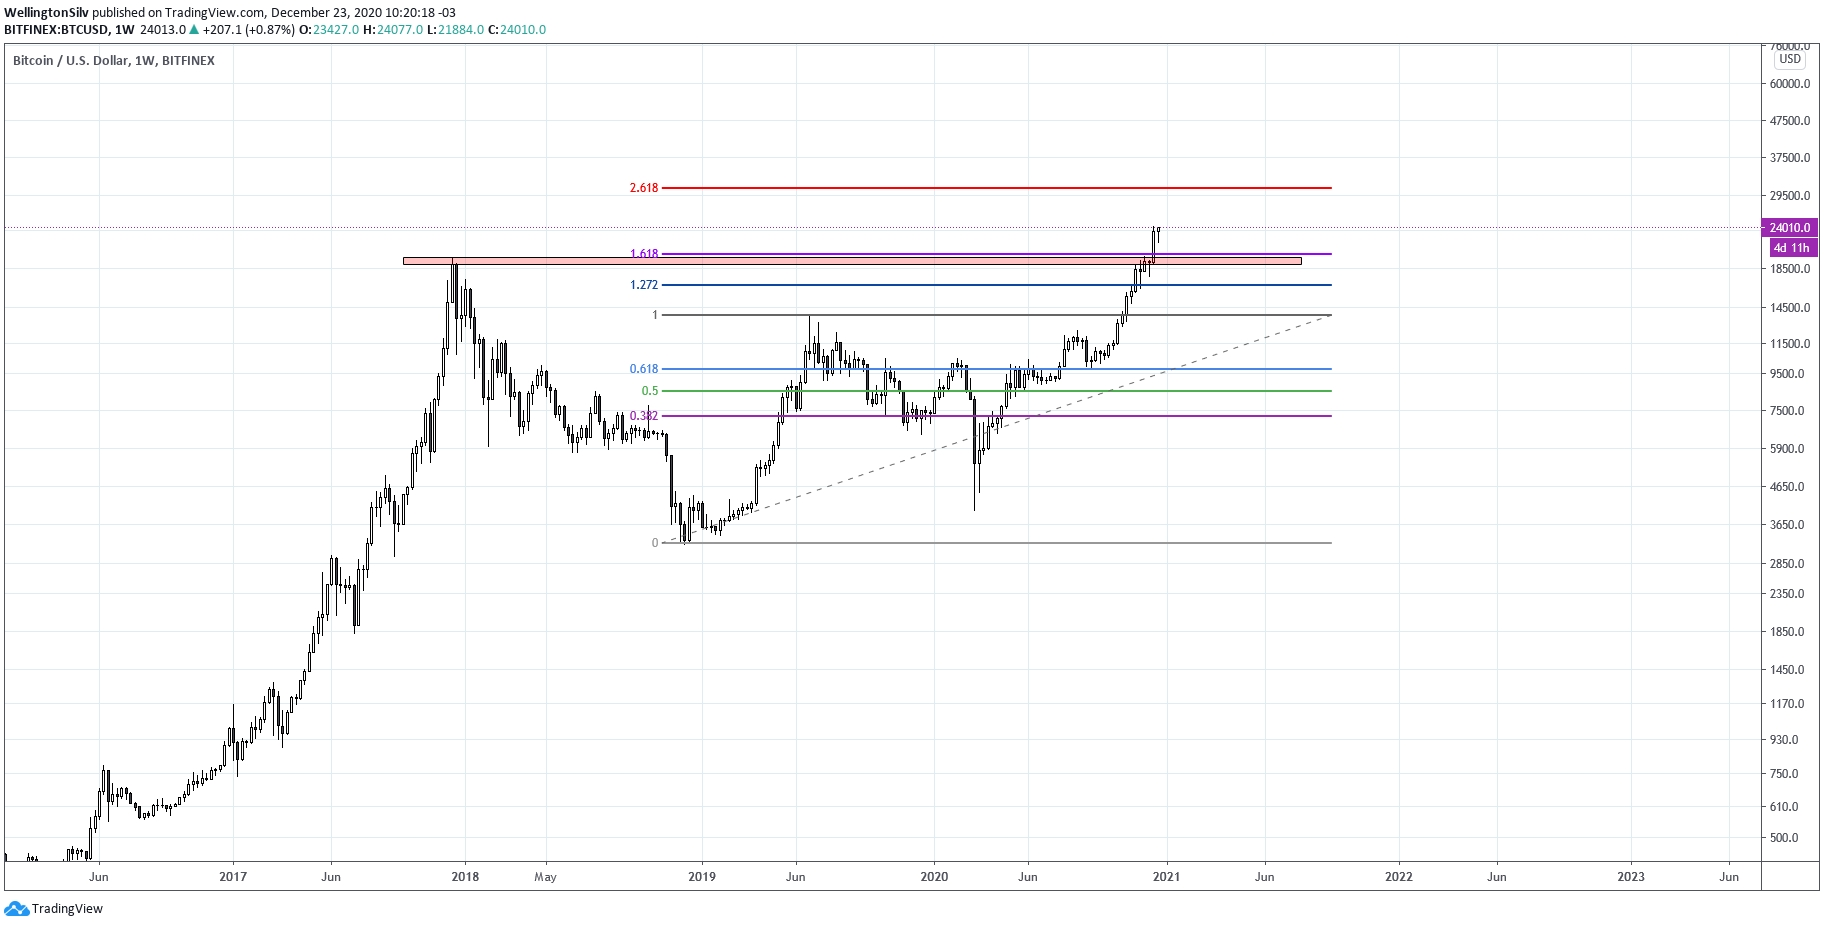 Gráfico semanal do Bitcoin (W)